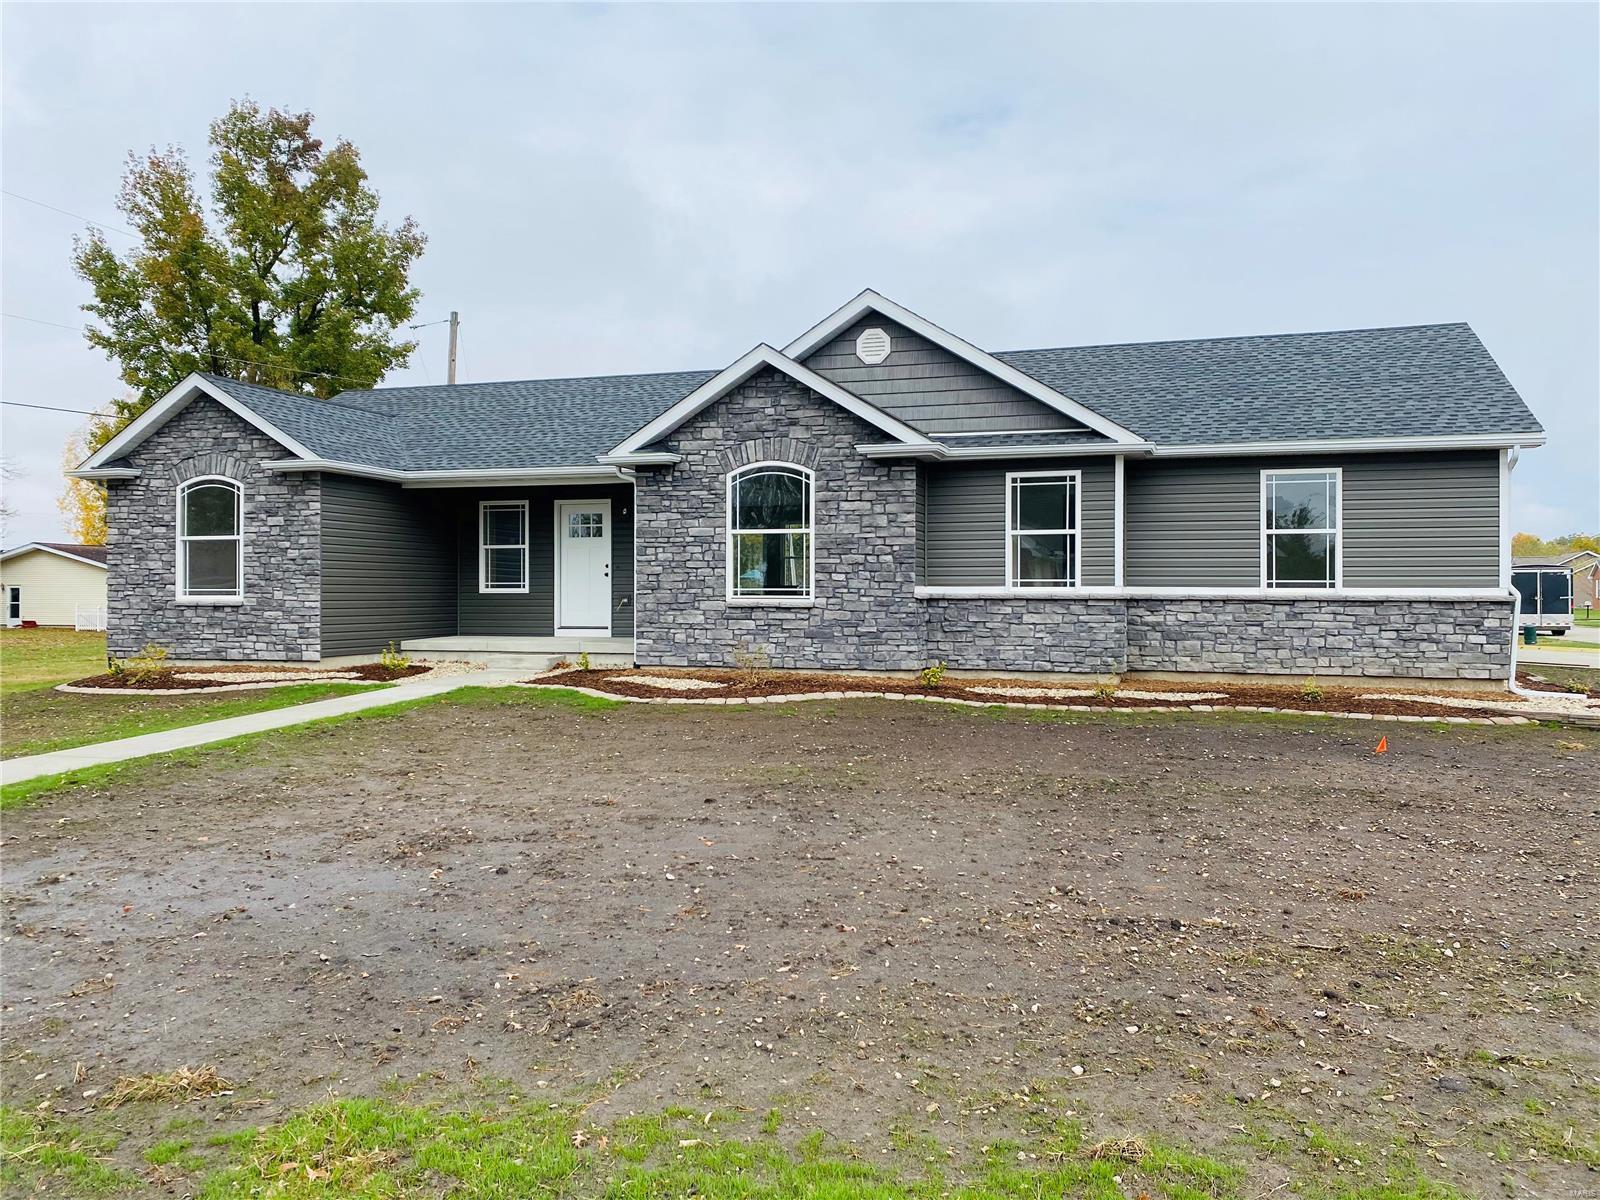 611 Crosswinds Property Photo - Jerseyville, IL real estate listing